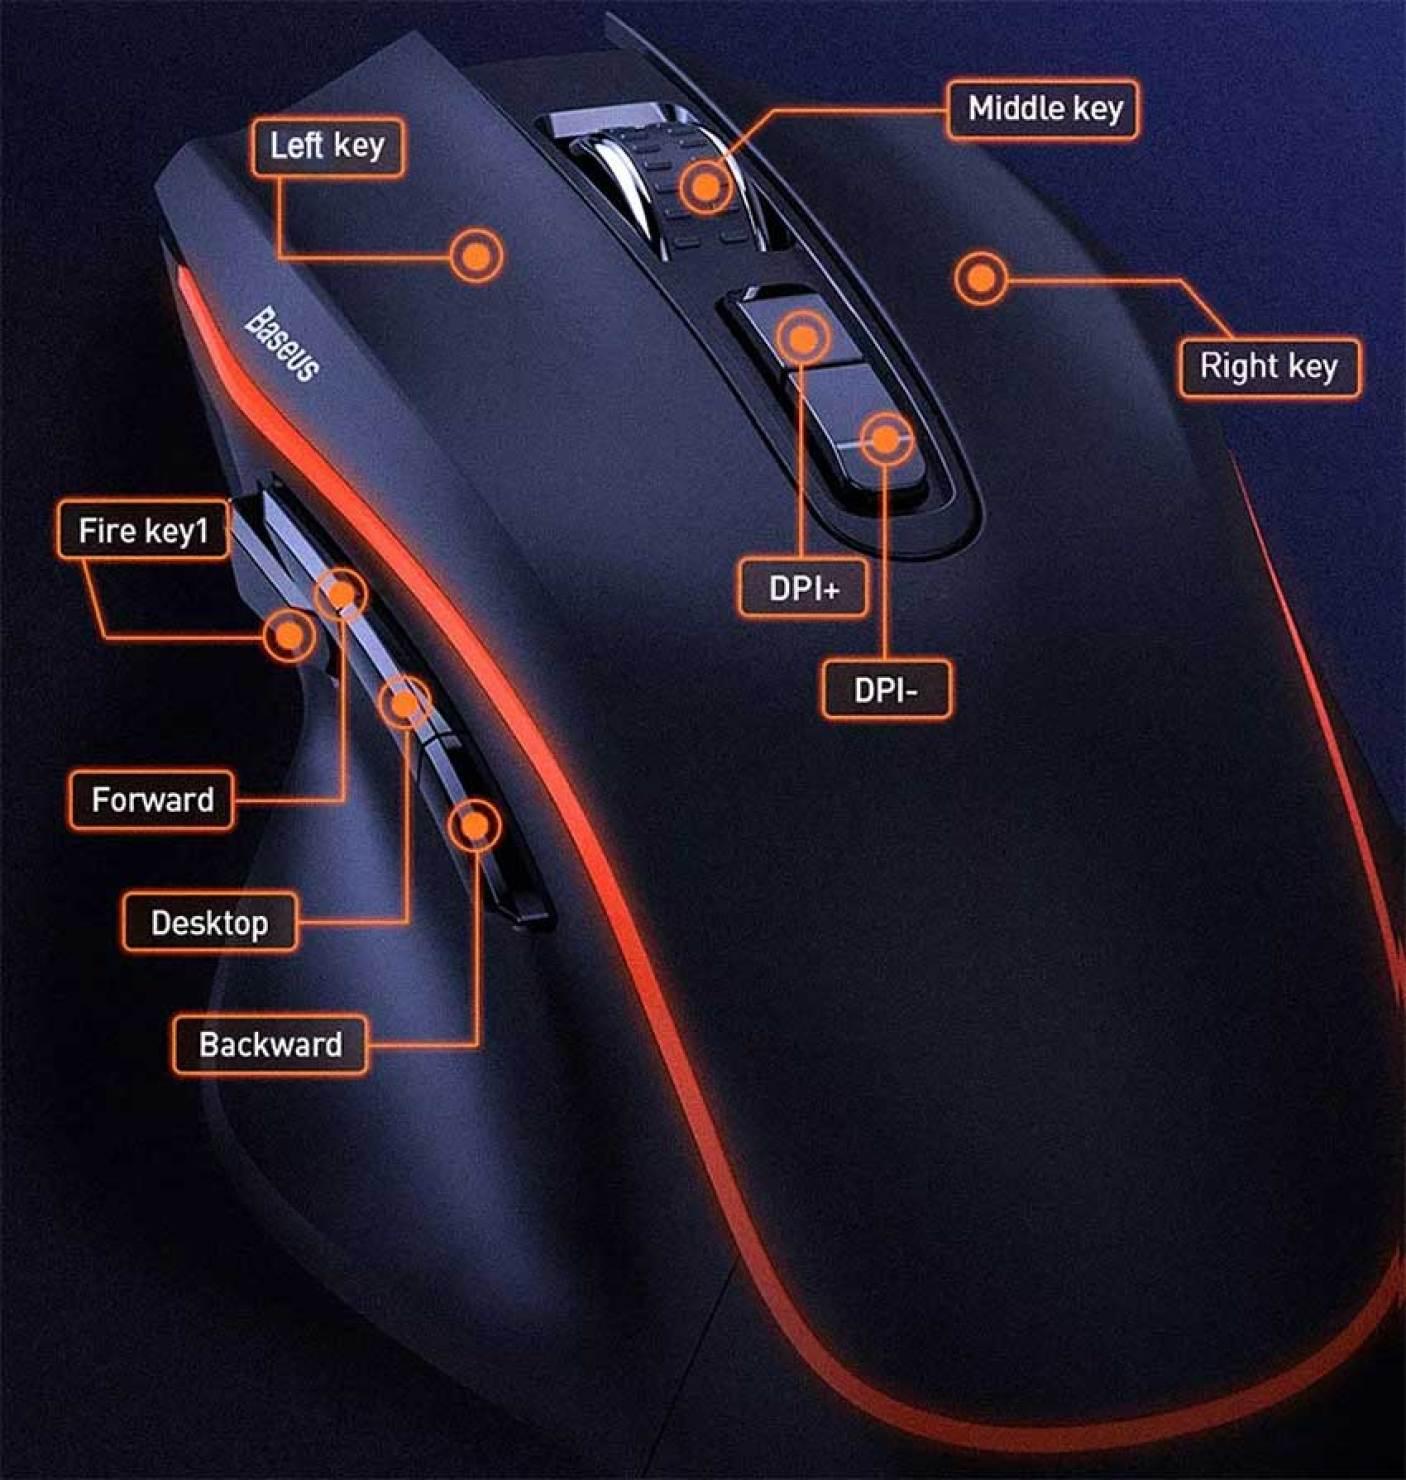 Baseus-Gaming-Mouse-Bd.jpg2.jpg?15978258